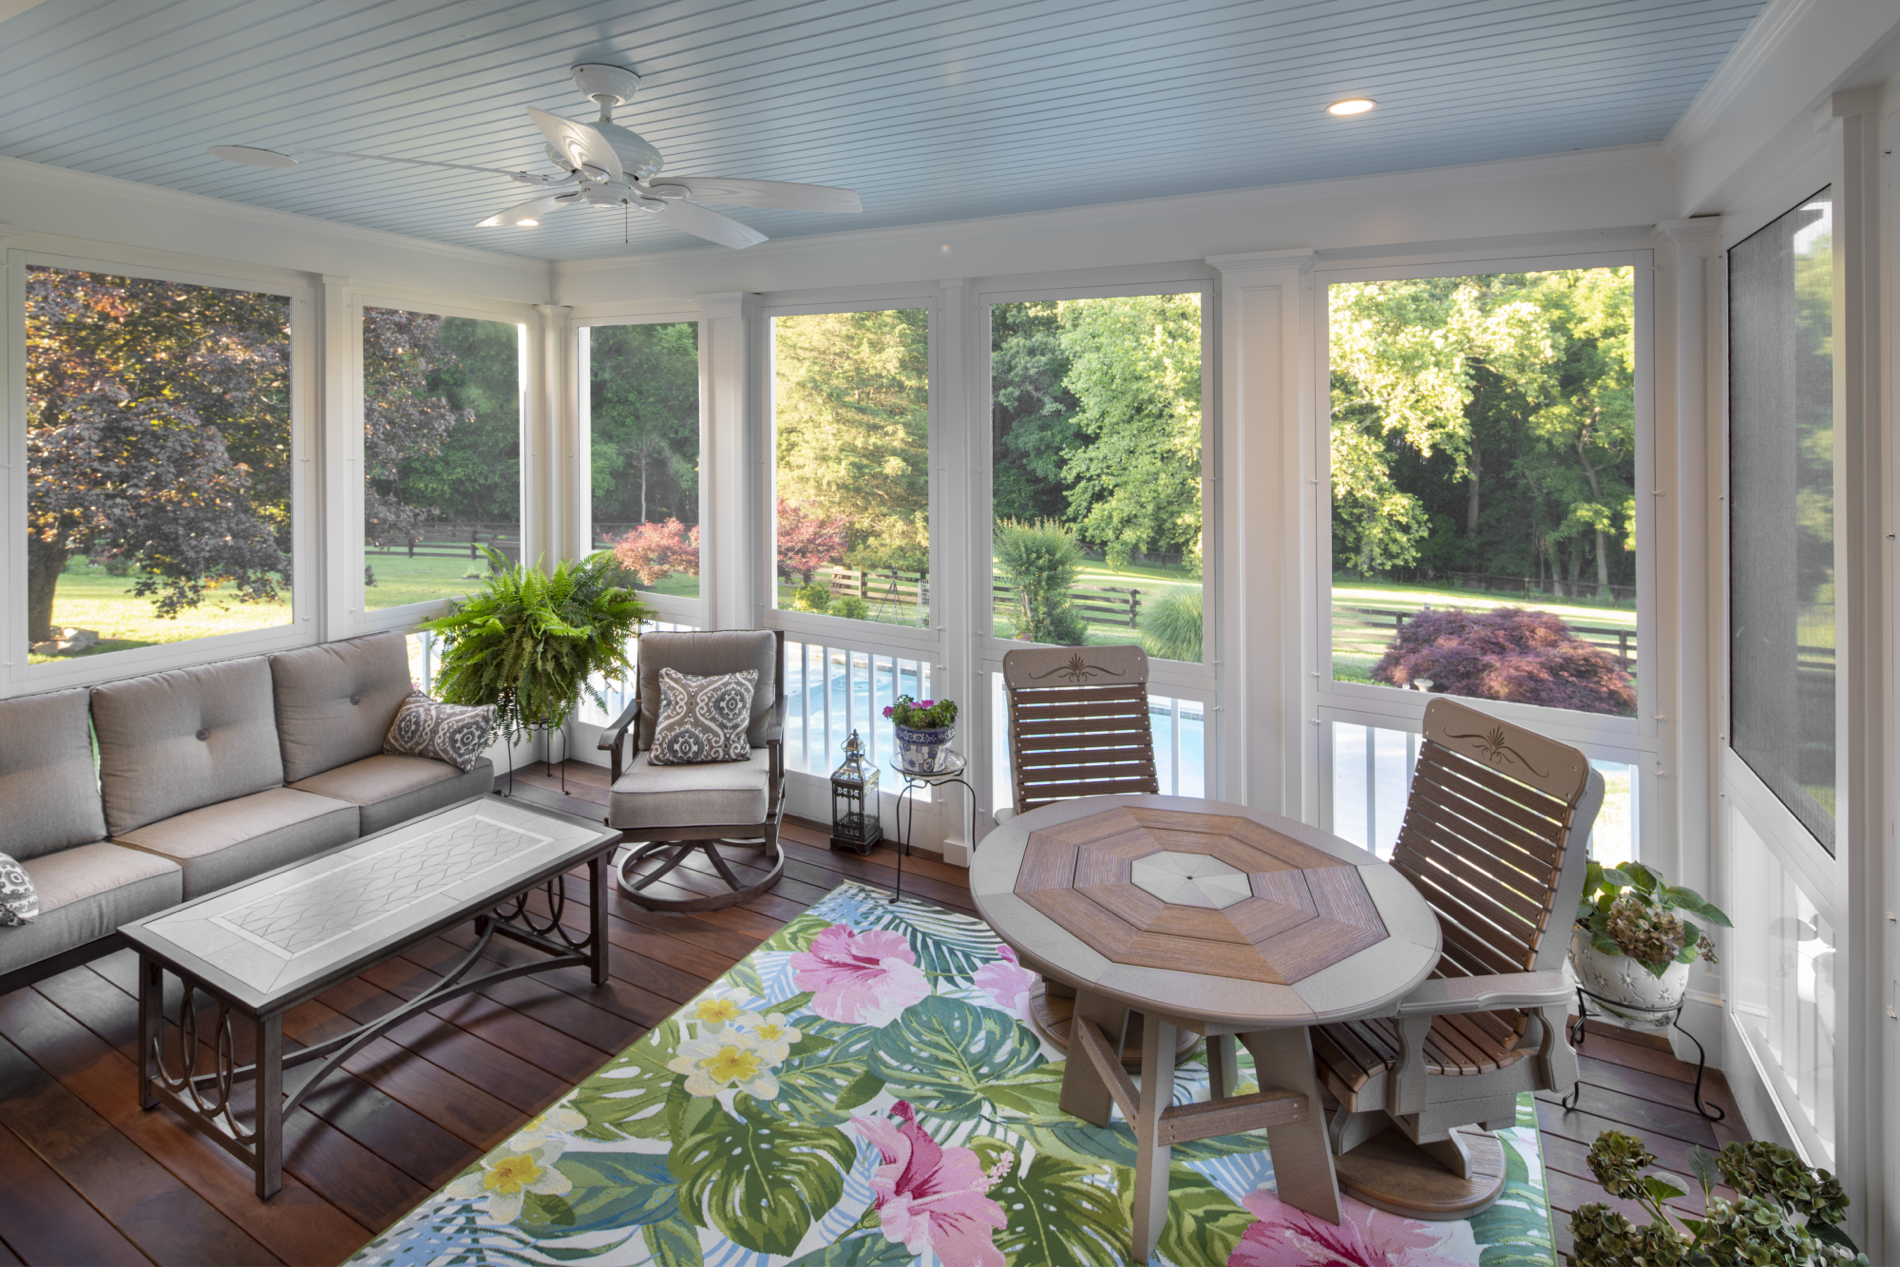 Scenic Overlook Porch Addition interior view